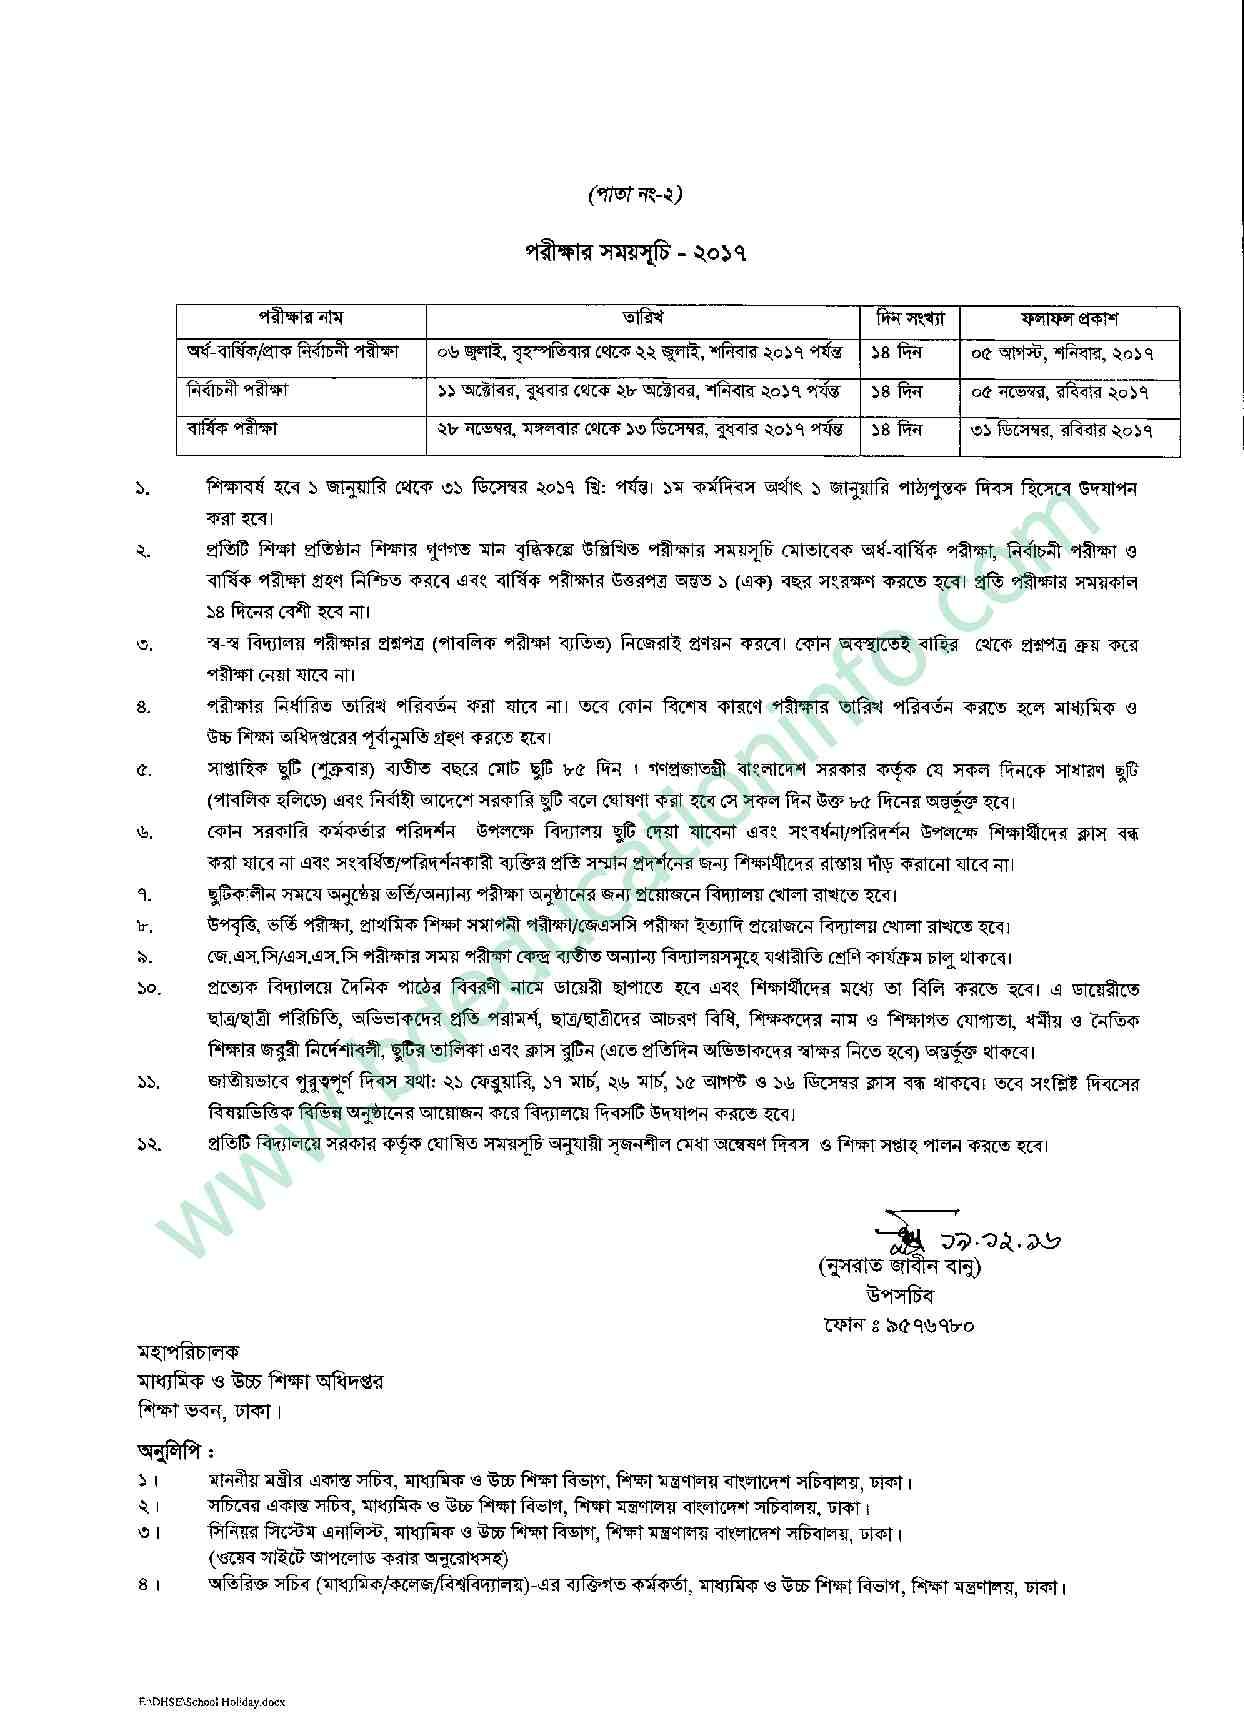 Bangladesh Holidays 2017